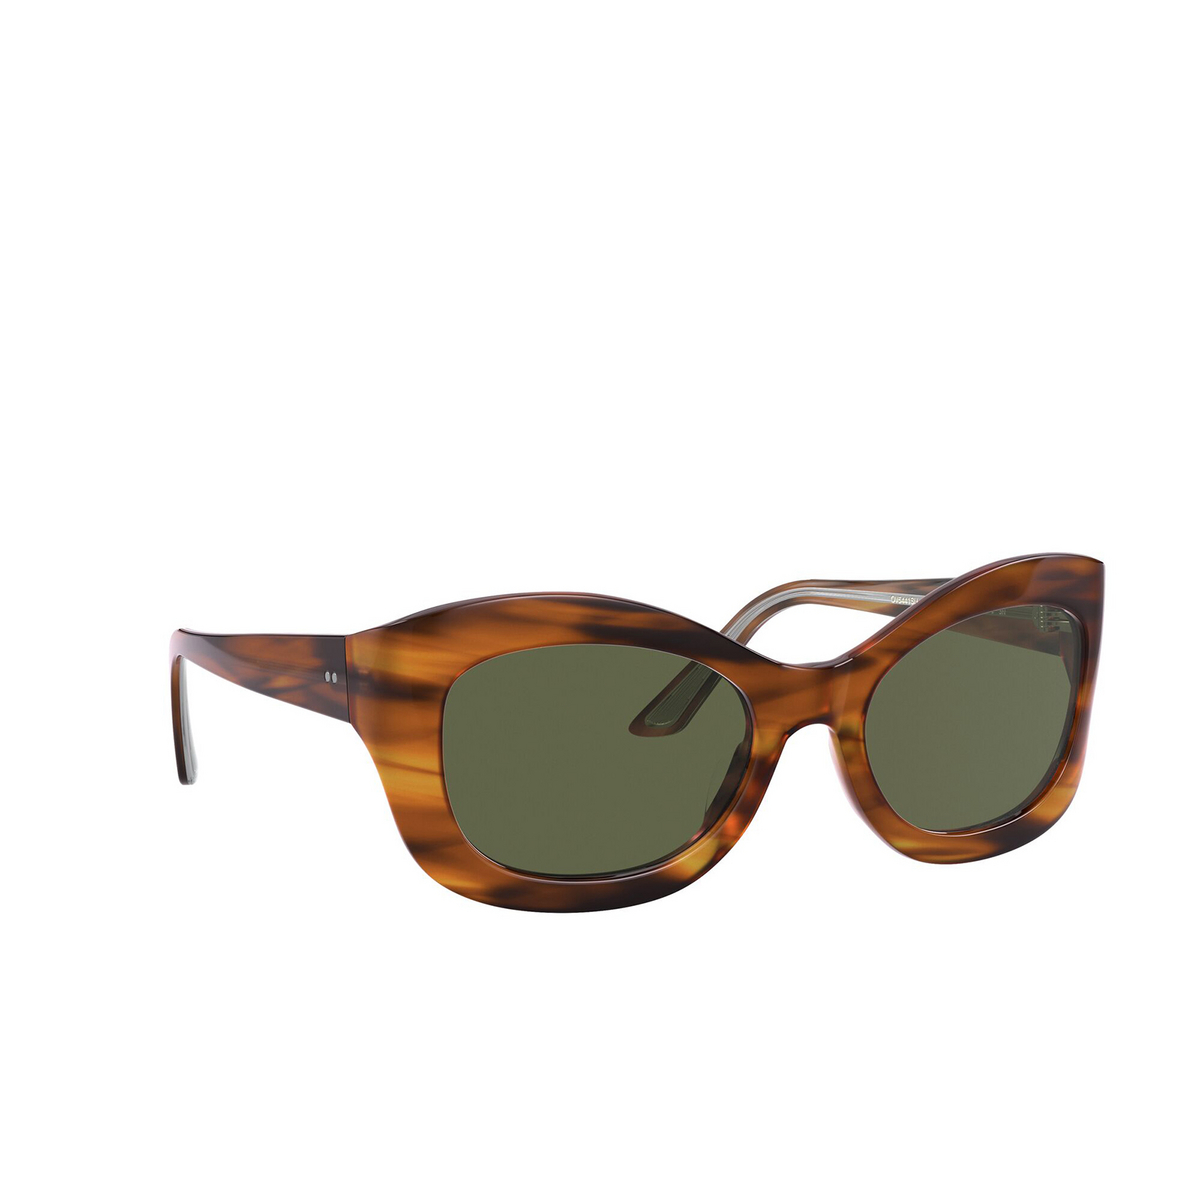 Oliver Peoples® Butterfly Sunglasses: Edina OV5441SU color Raintree 101171 - three-quarters view.